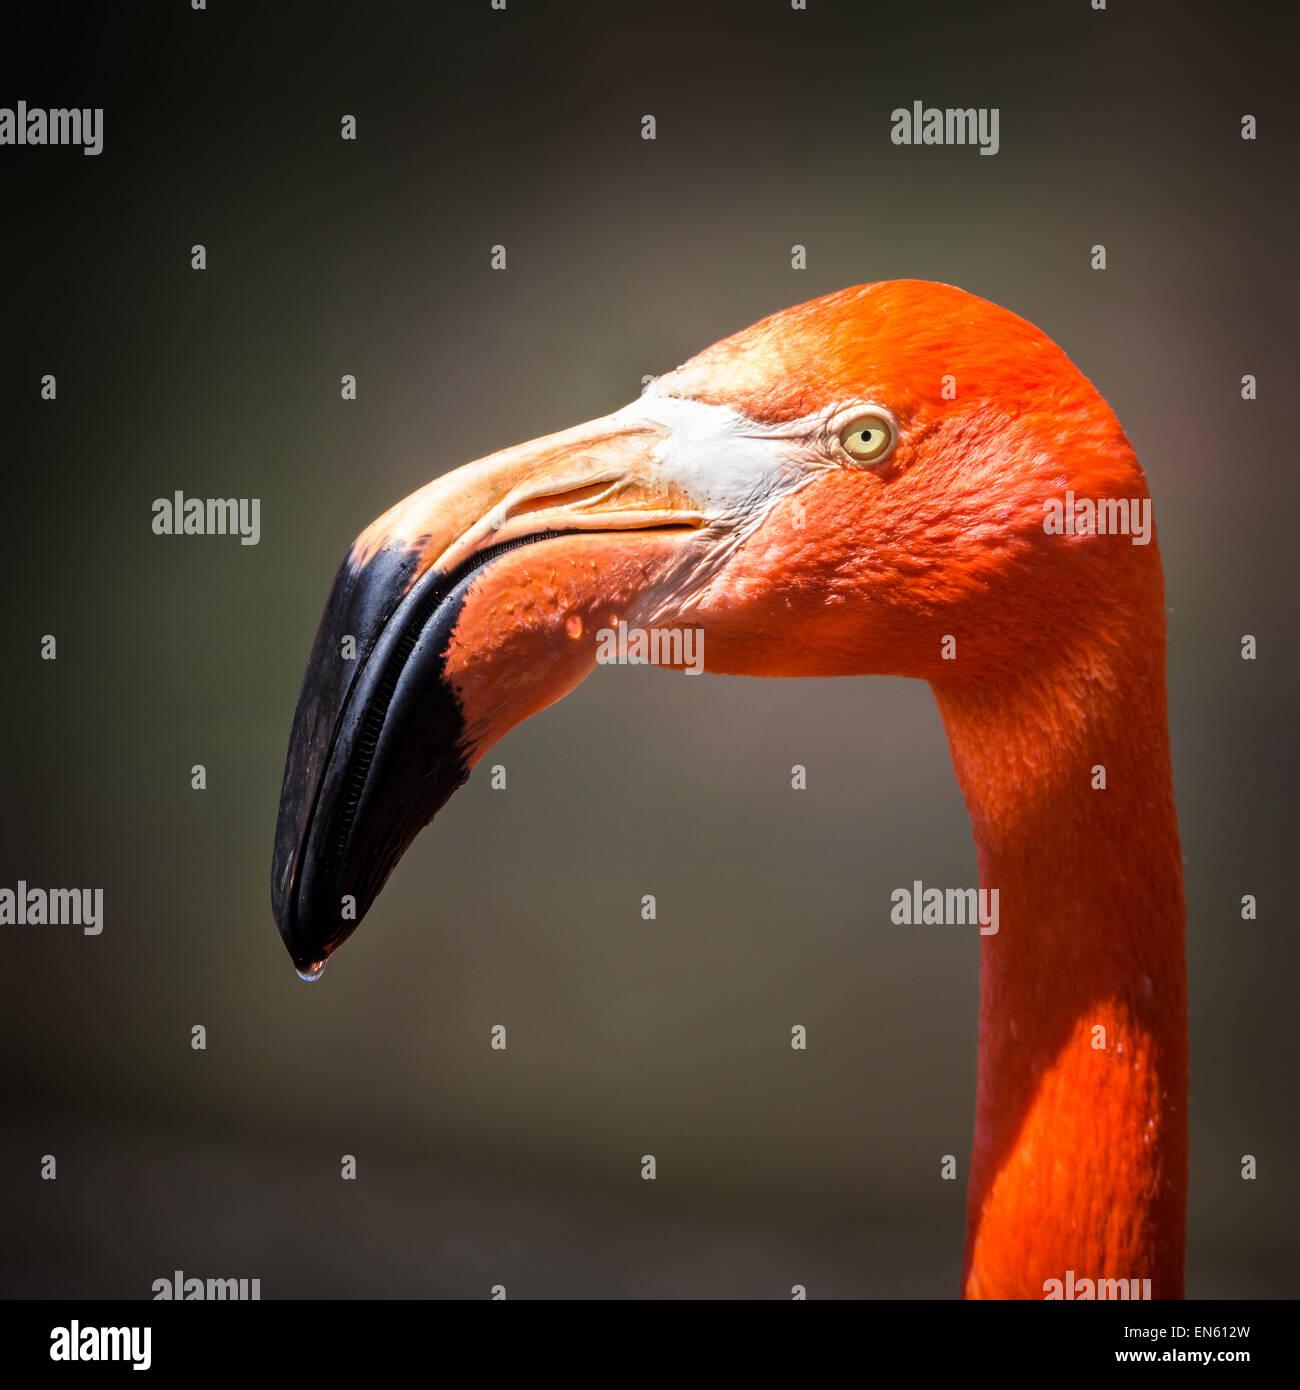 American flamingo profile portrait - Stock Image